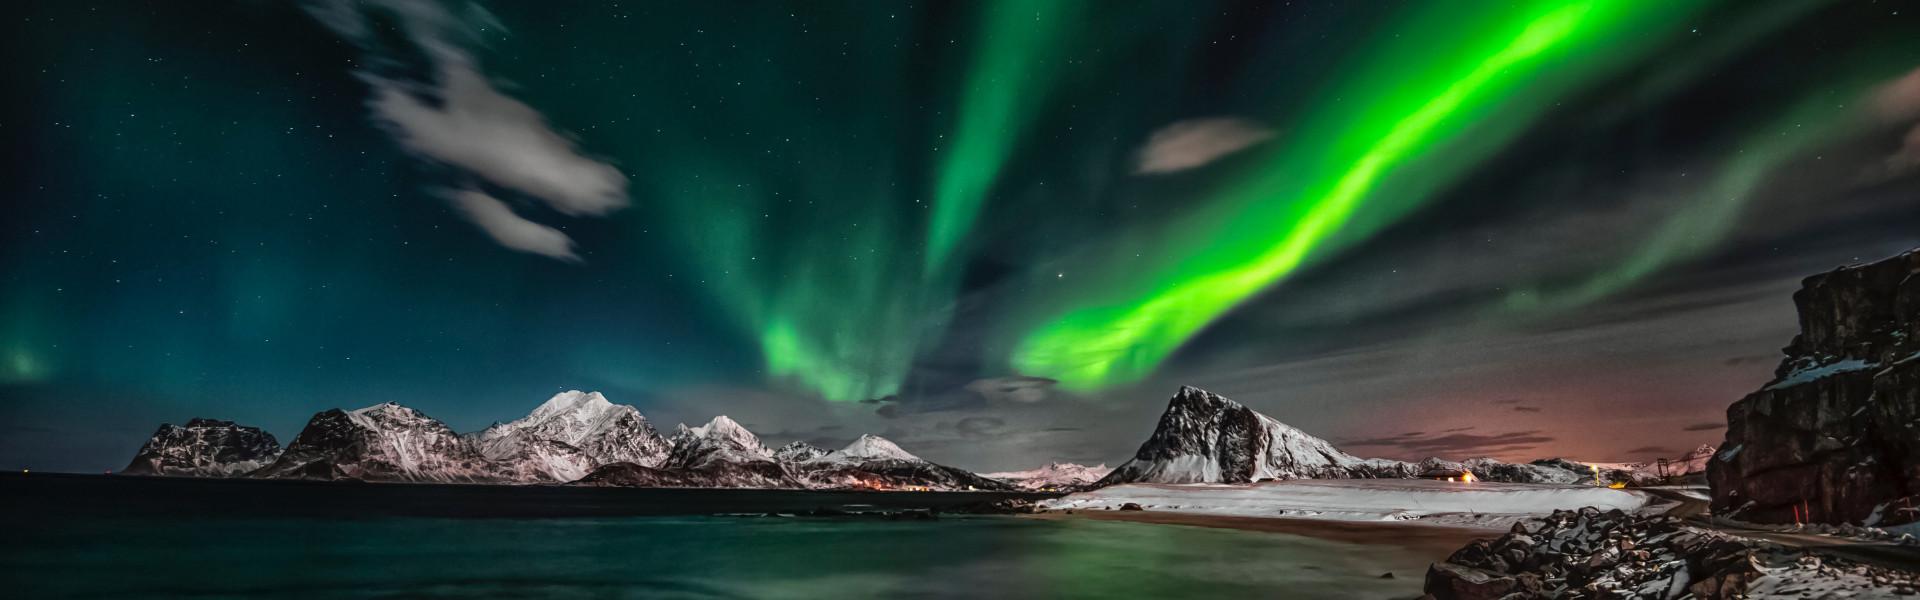 Destination image of Pays scandinaves